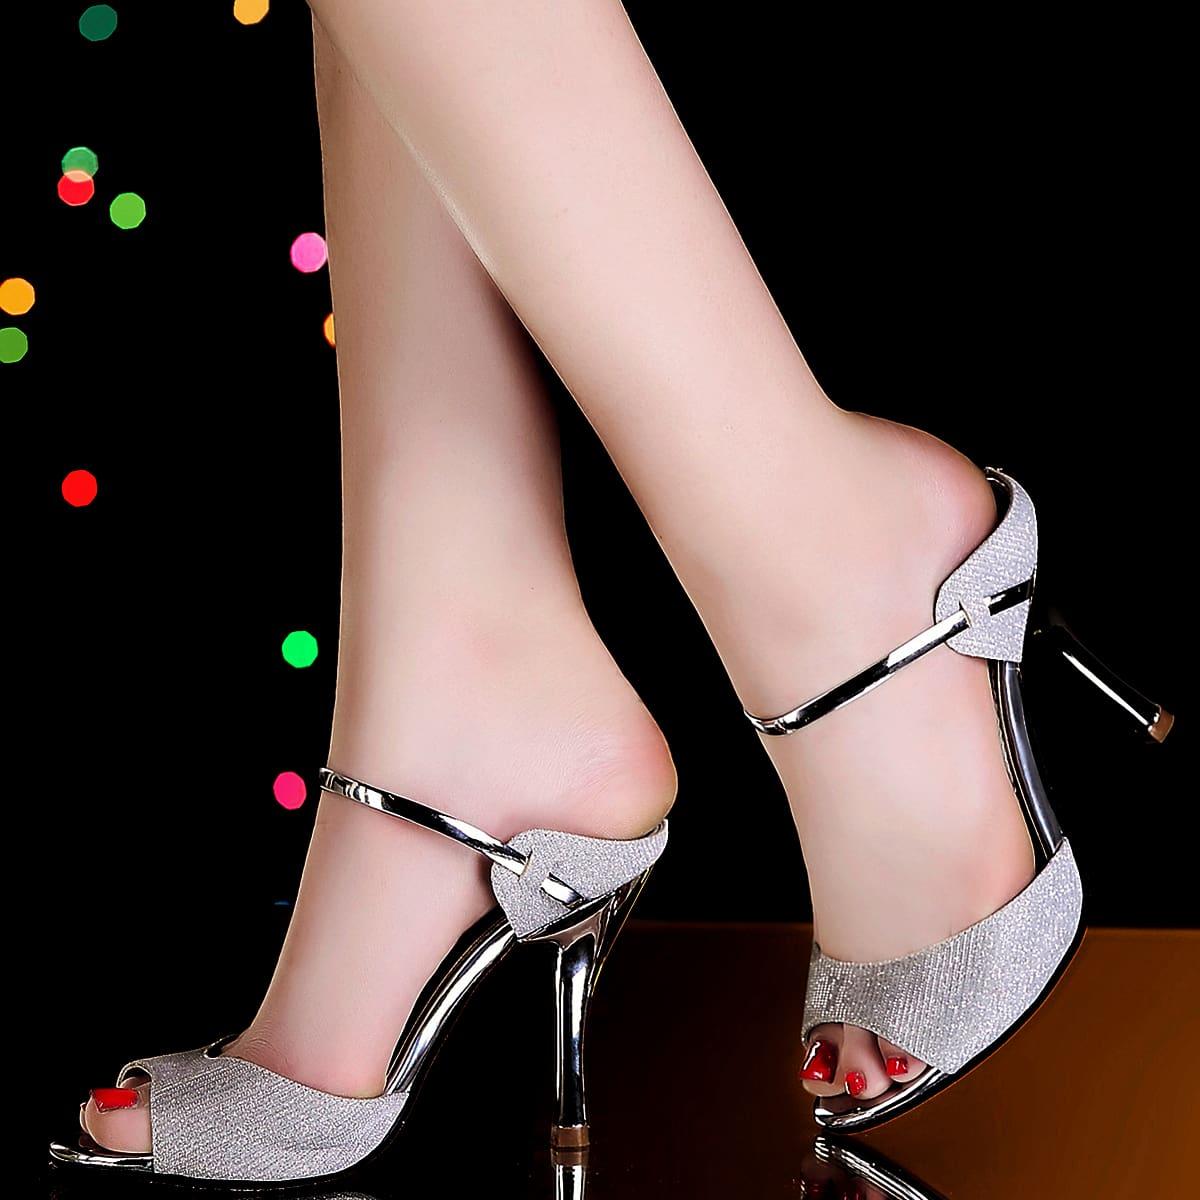 Glitter Decor Peep Toe Stiletto Heeled Pumps